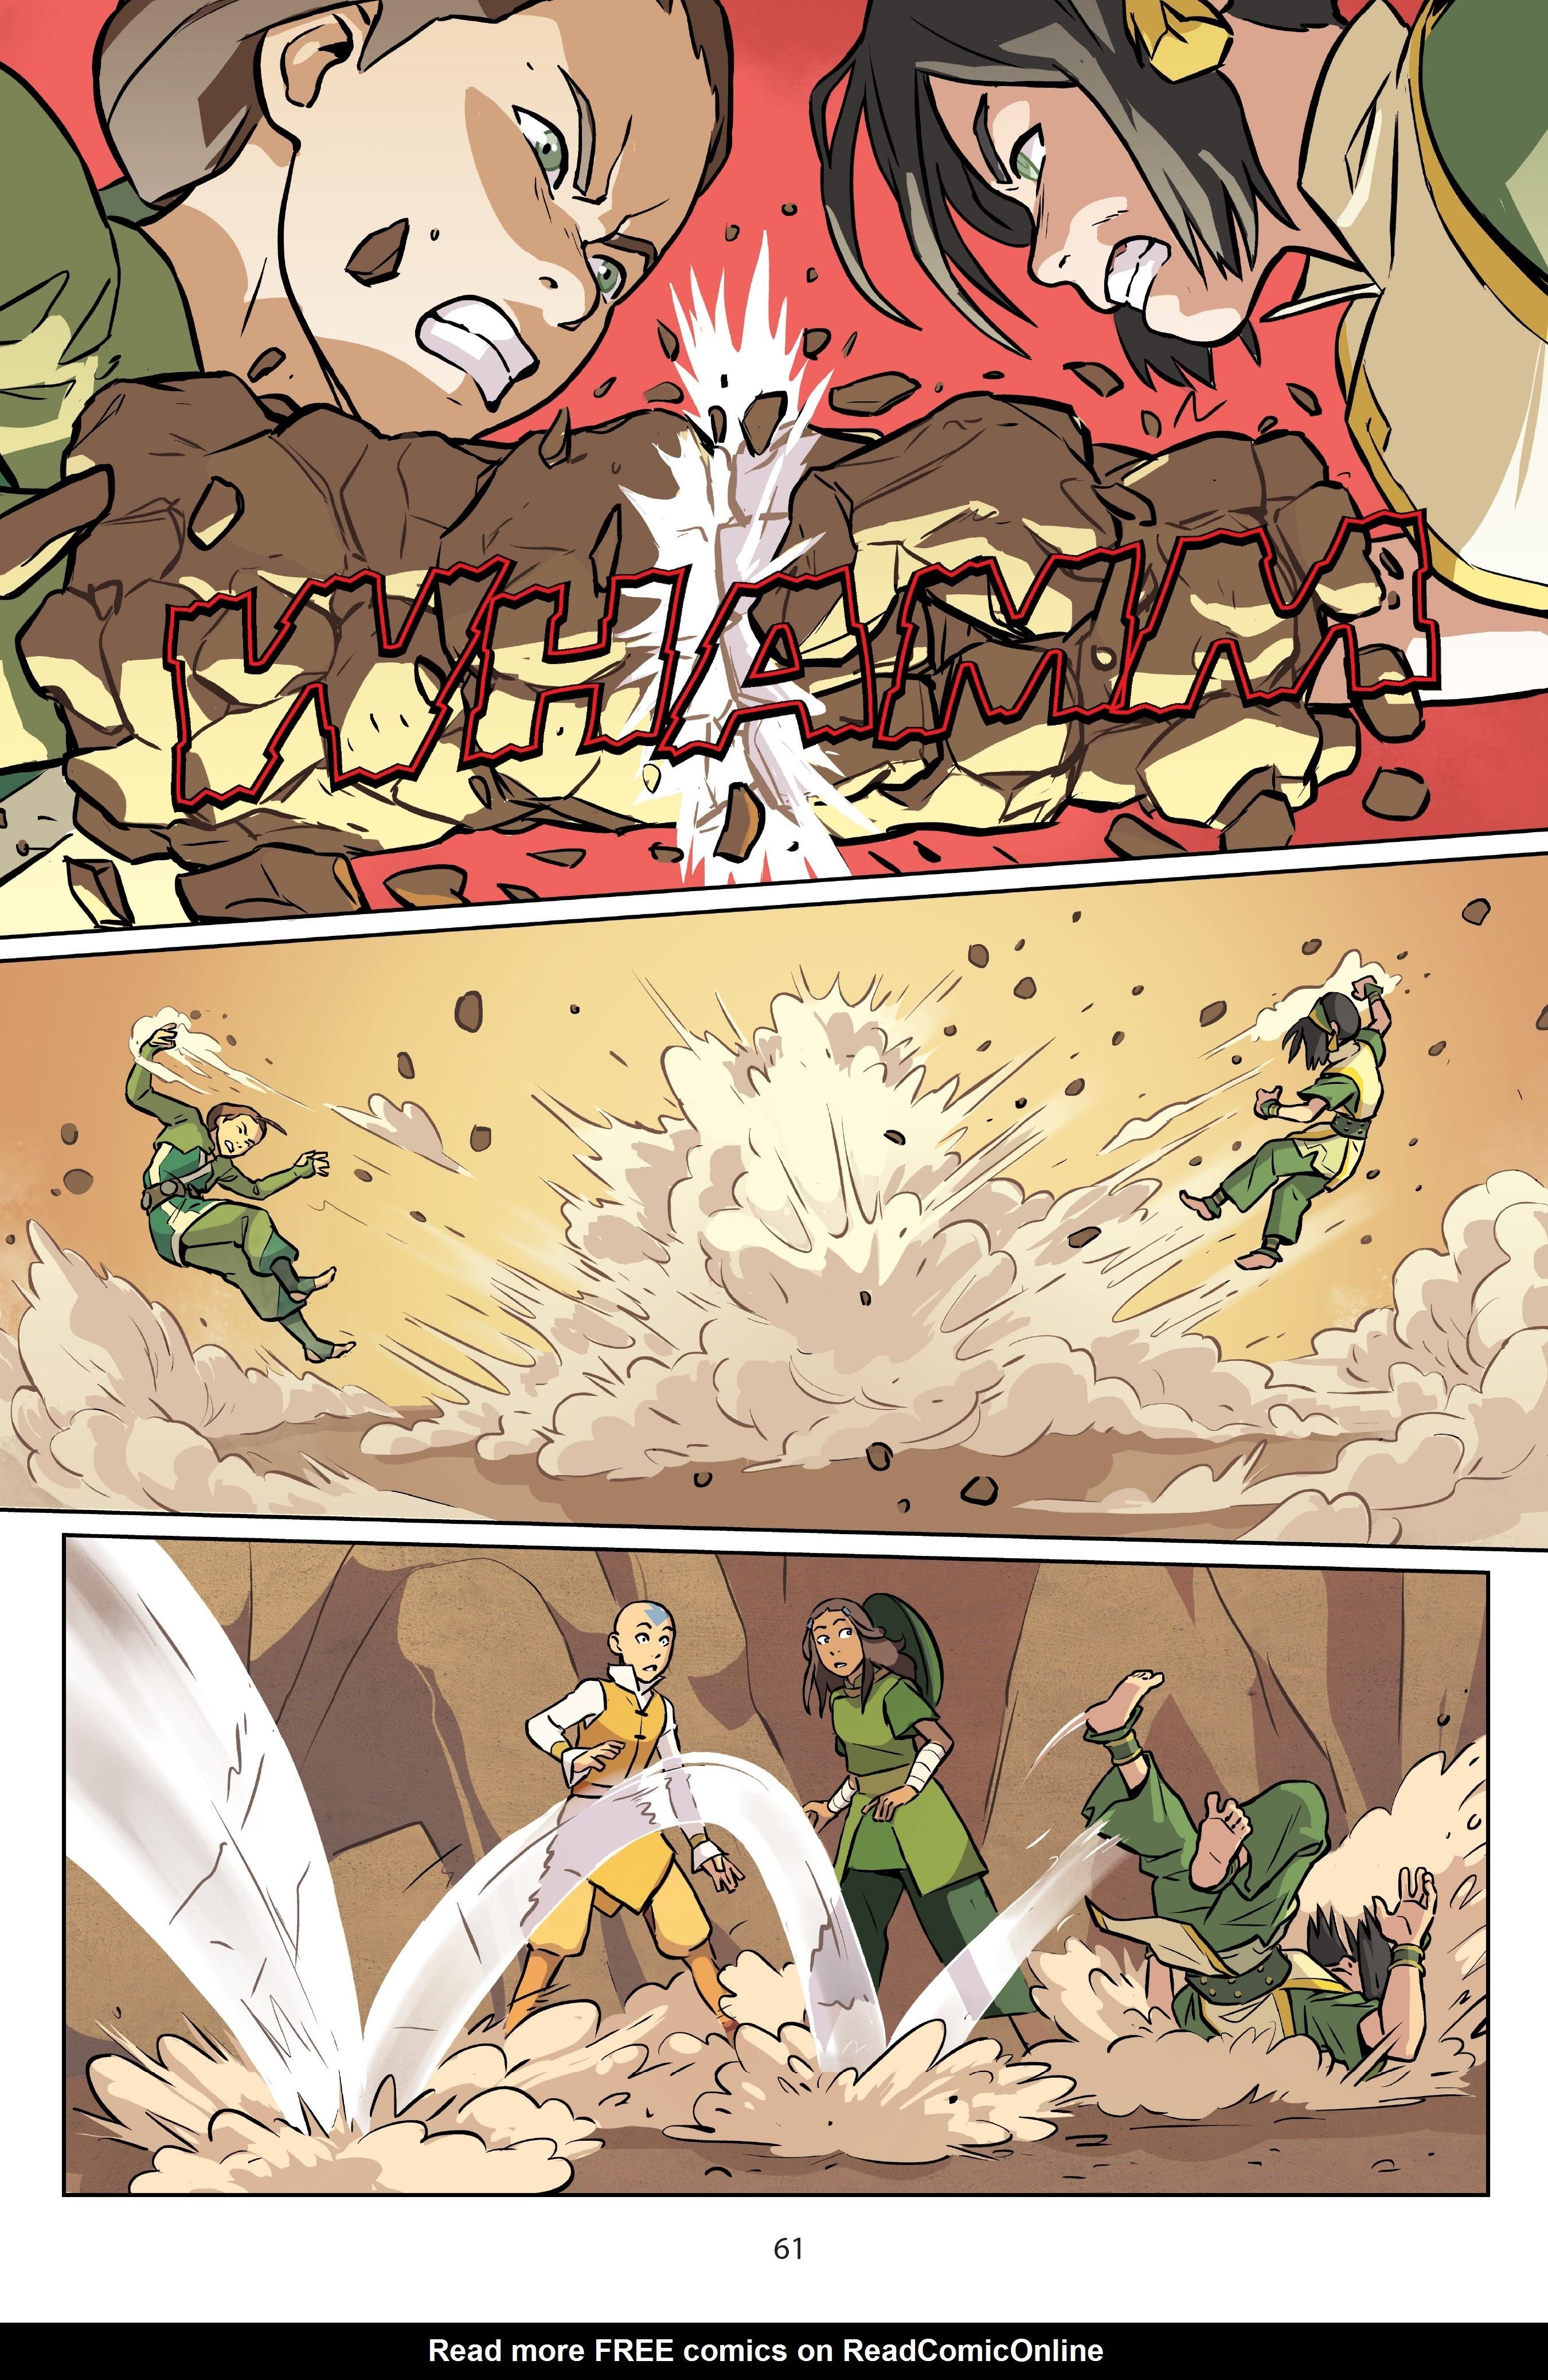 Nickelodeon Avatar: The Last Airbender - Imbalance TPB_2 Page 61